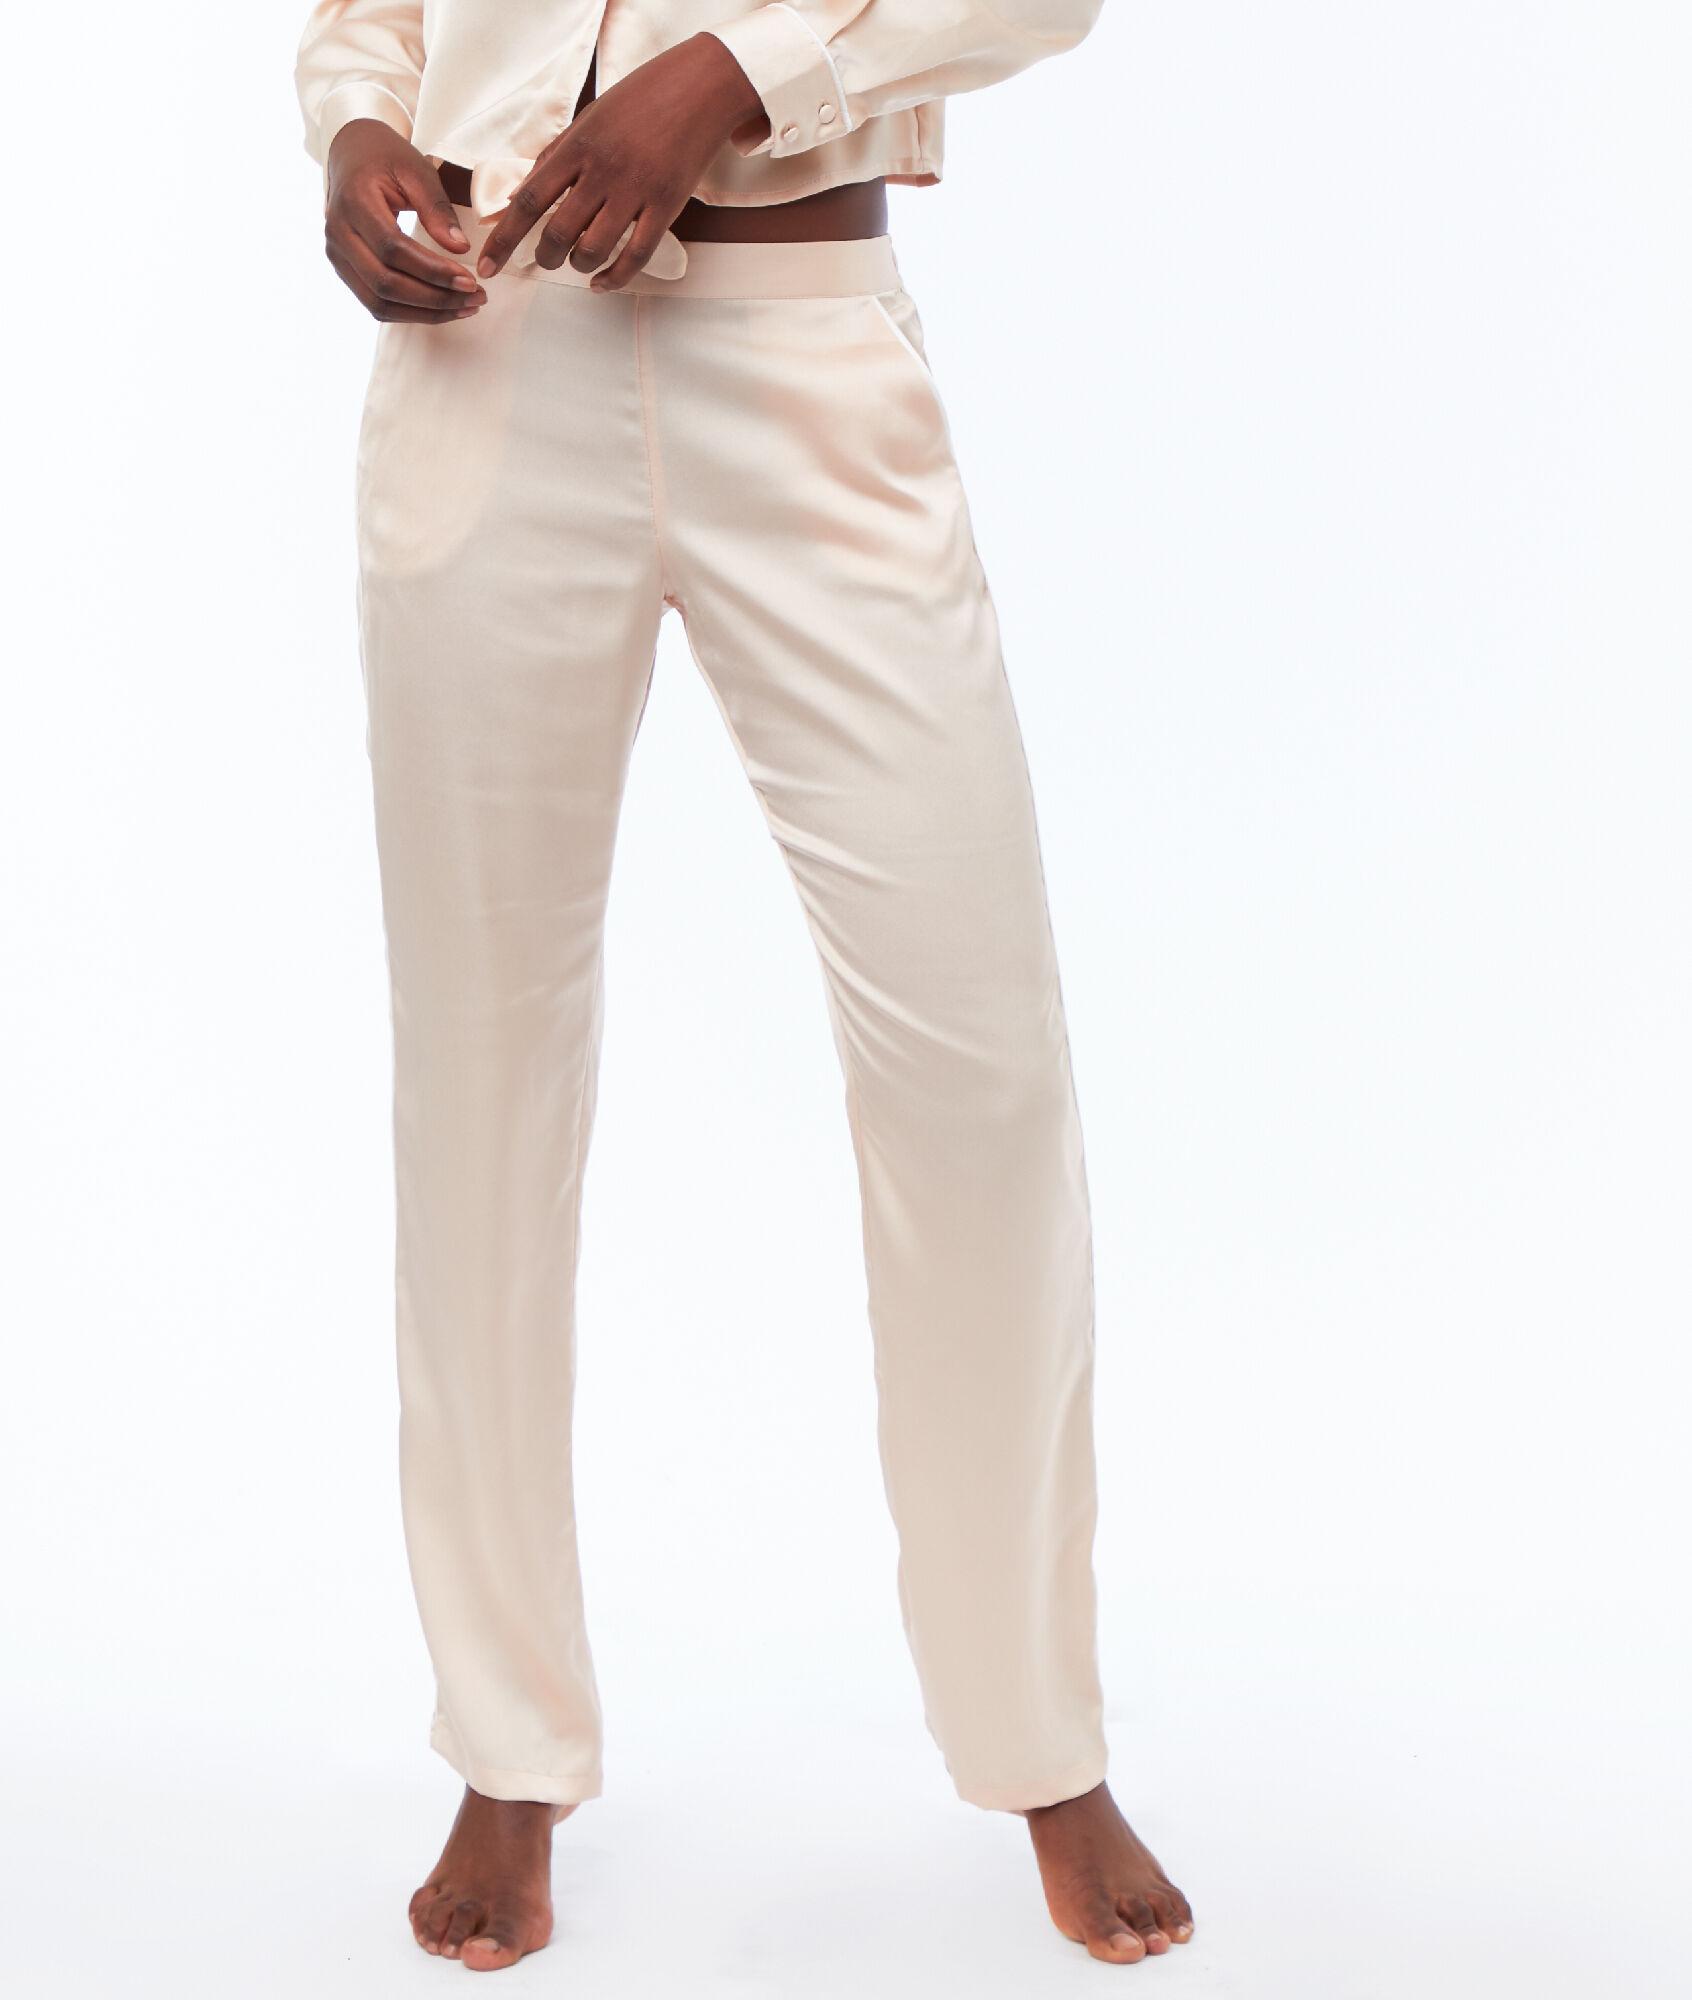 a2c7024766208 Pantalon satin - MAUD - ROSE POUDRE - Etam